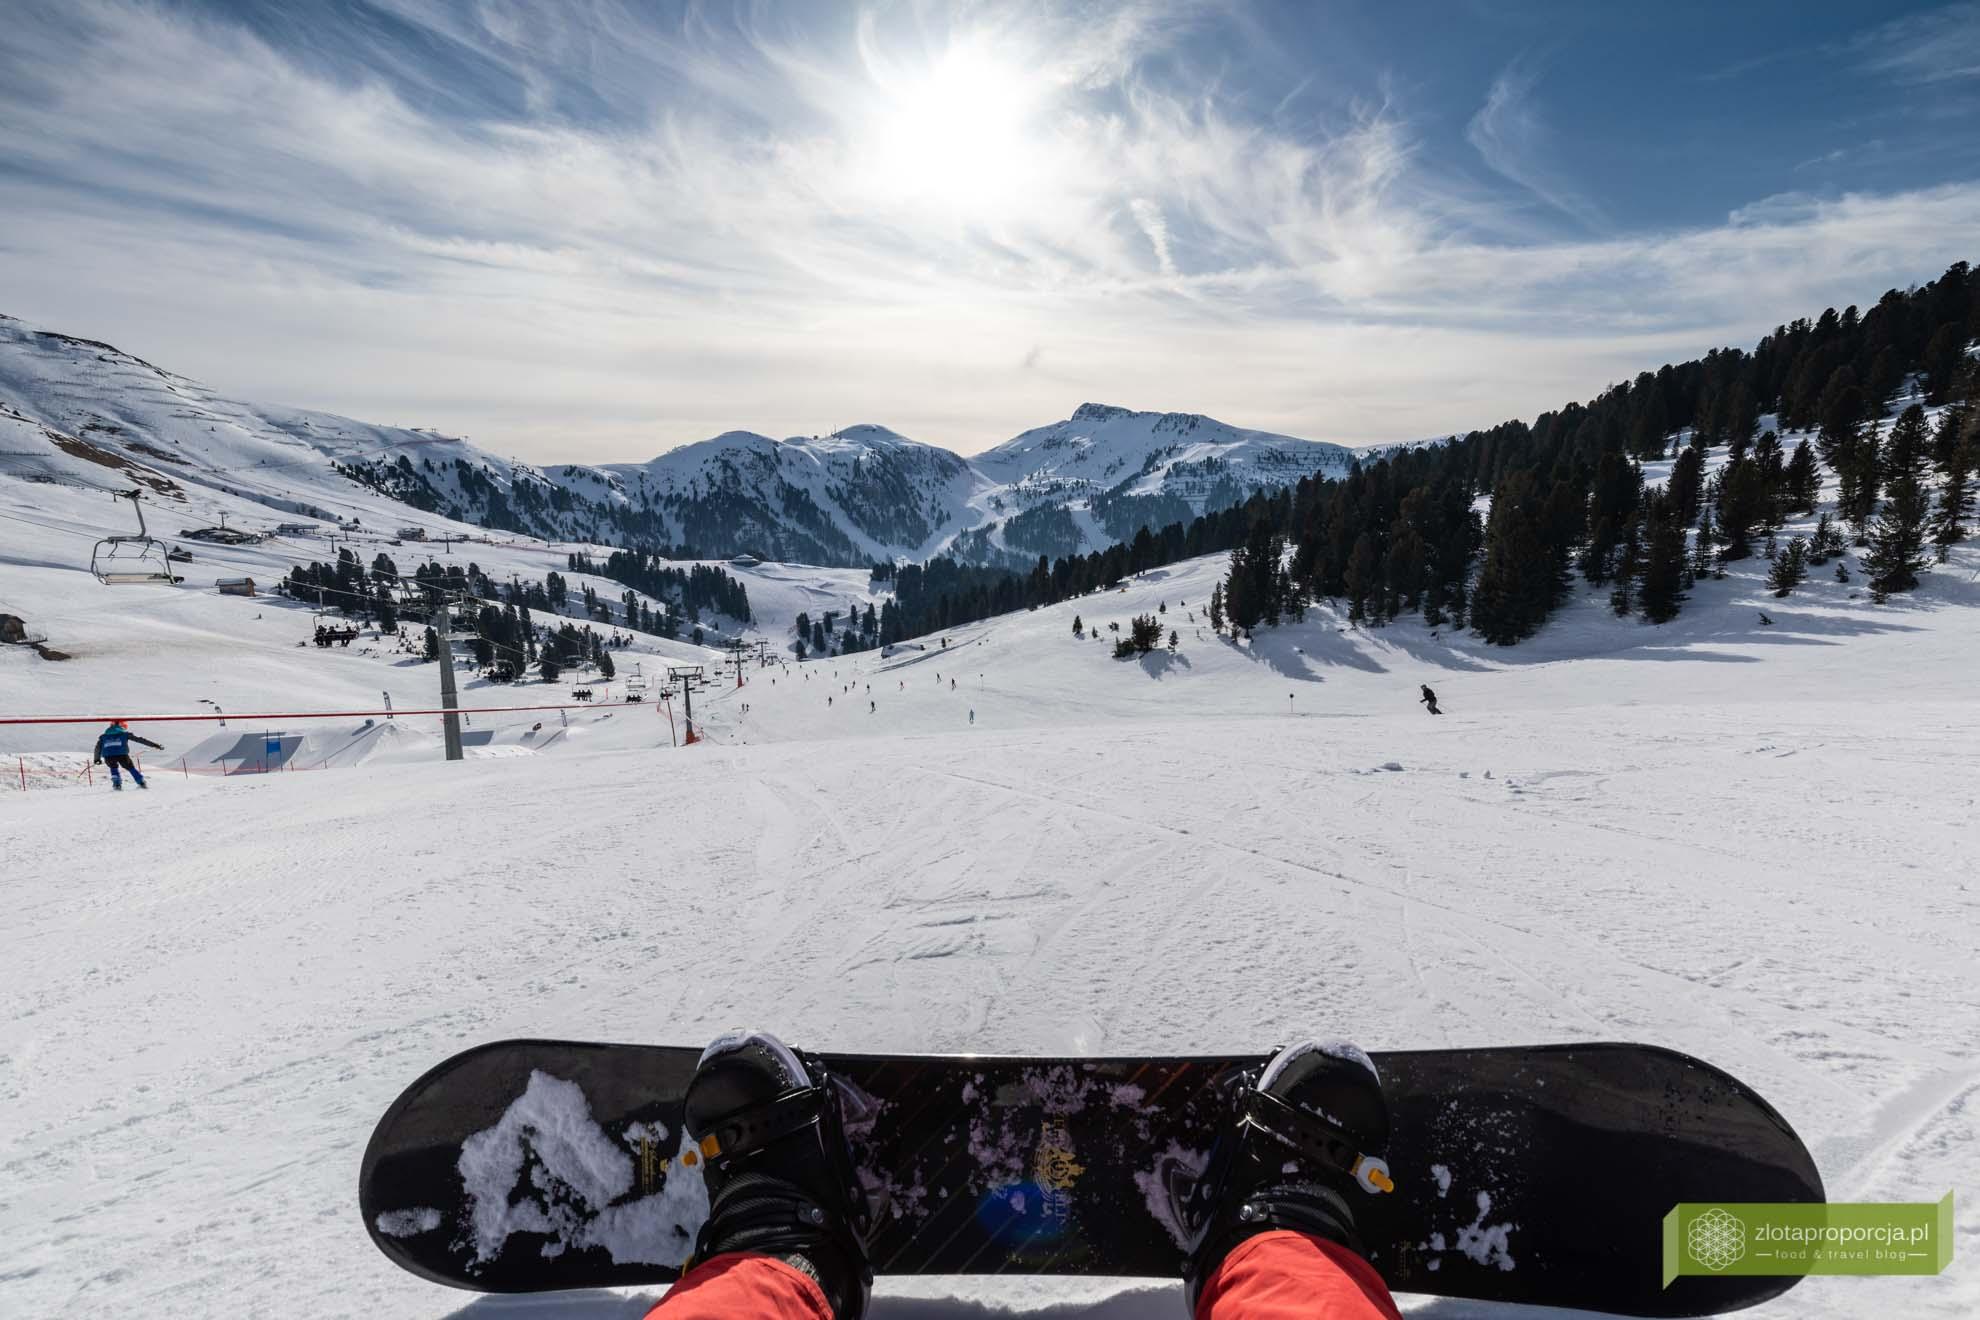 Południowy Tyrol; Val d'Ega; Eggental; Dolomity; narty Południowy Tyrol; Obereggen; Ski Center Obereggen; ośrodek narciarski Obereegen; narty Obereggen; Oberegen narty; Obereggen ski;